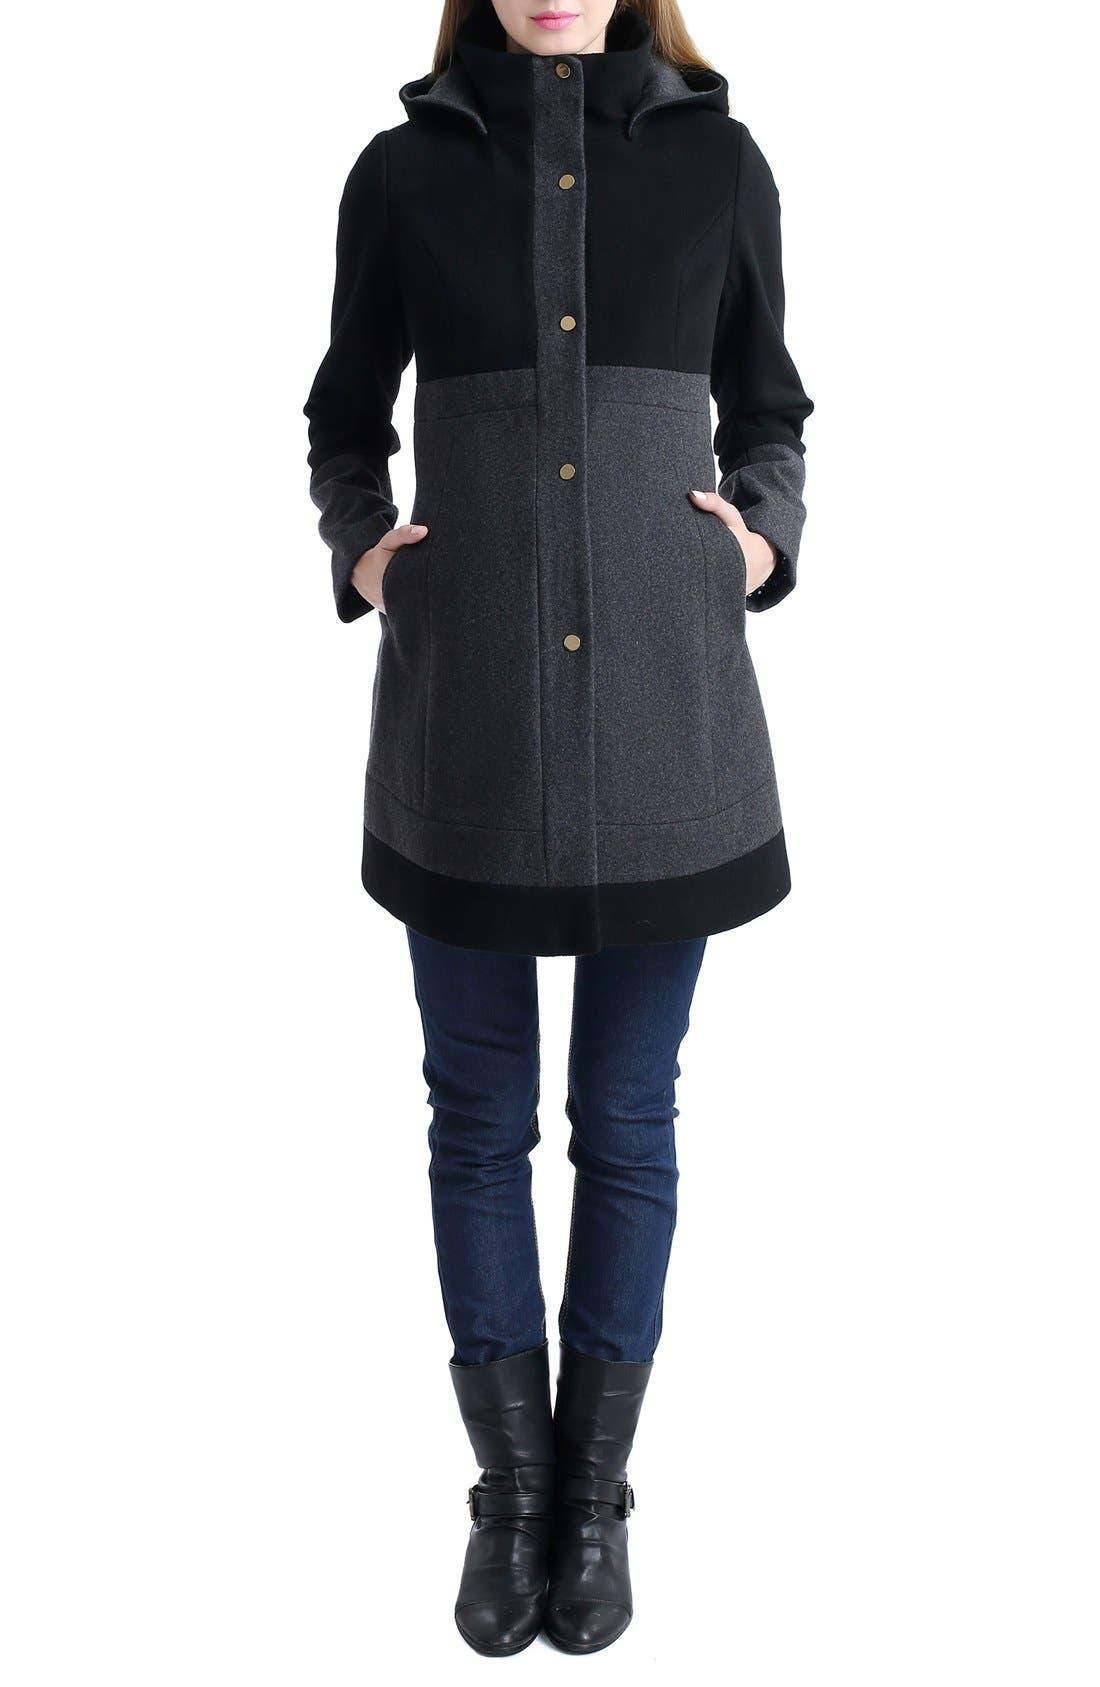 'Tessa' Colorblock Maternity Coat,                         Main,                         color, Black